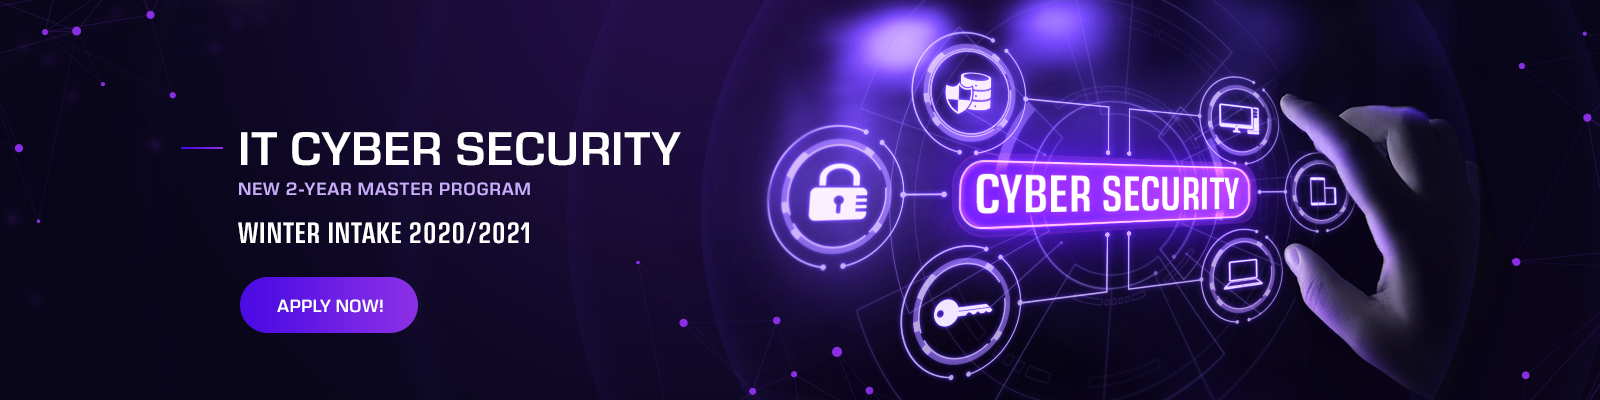 IT Cyber Security - new program!